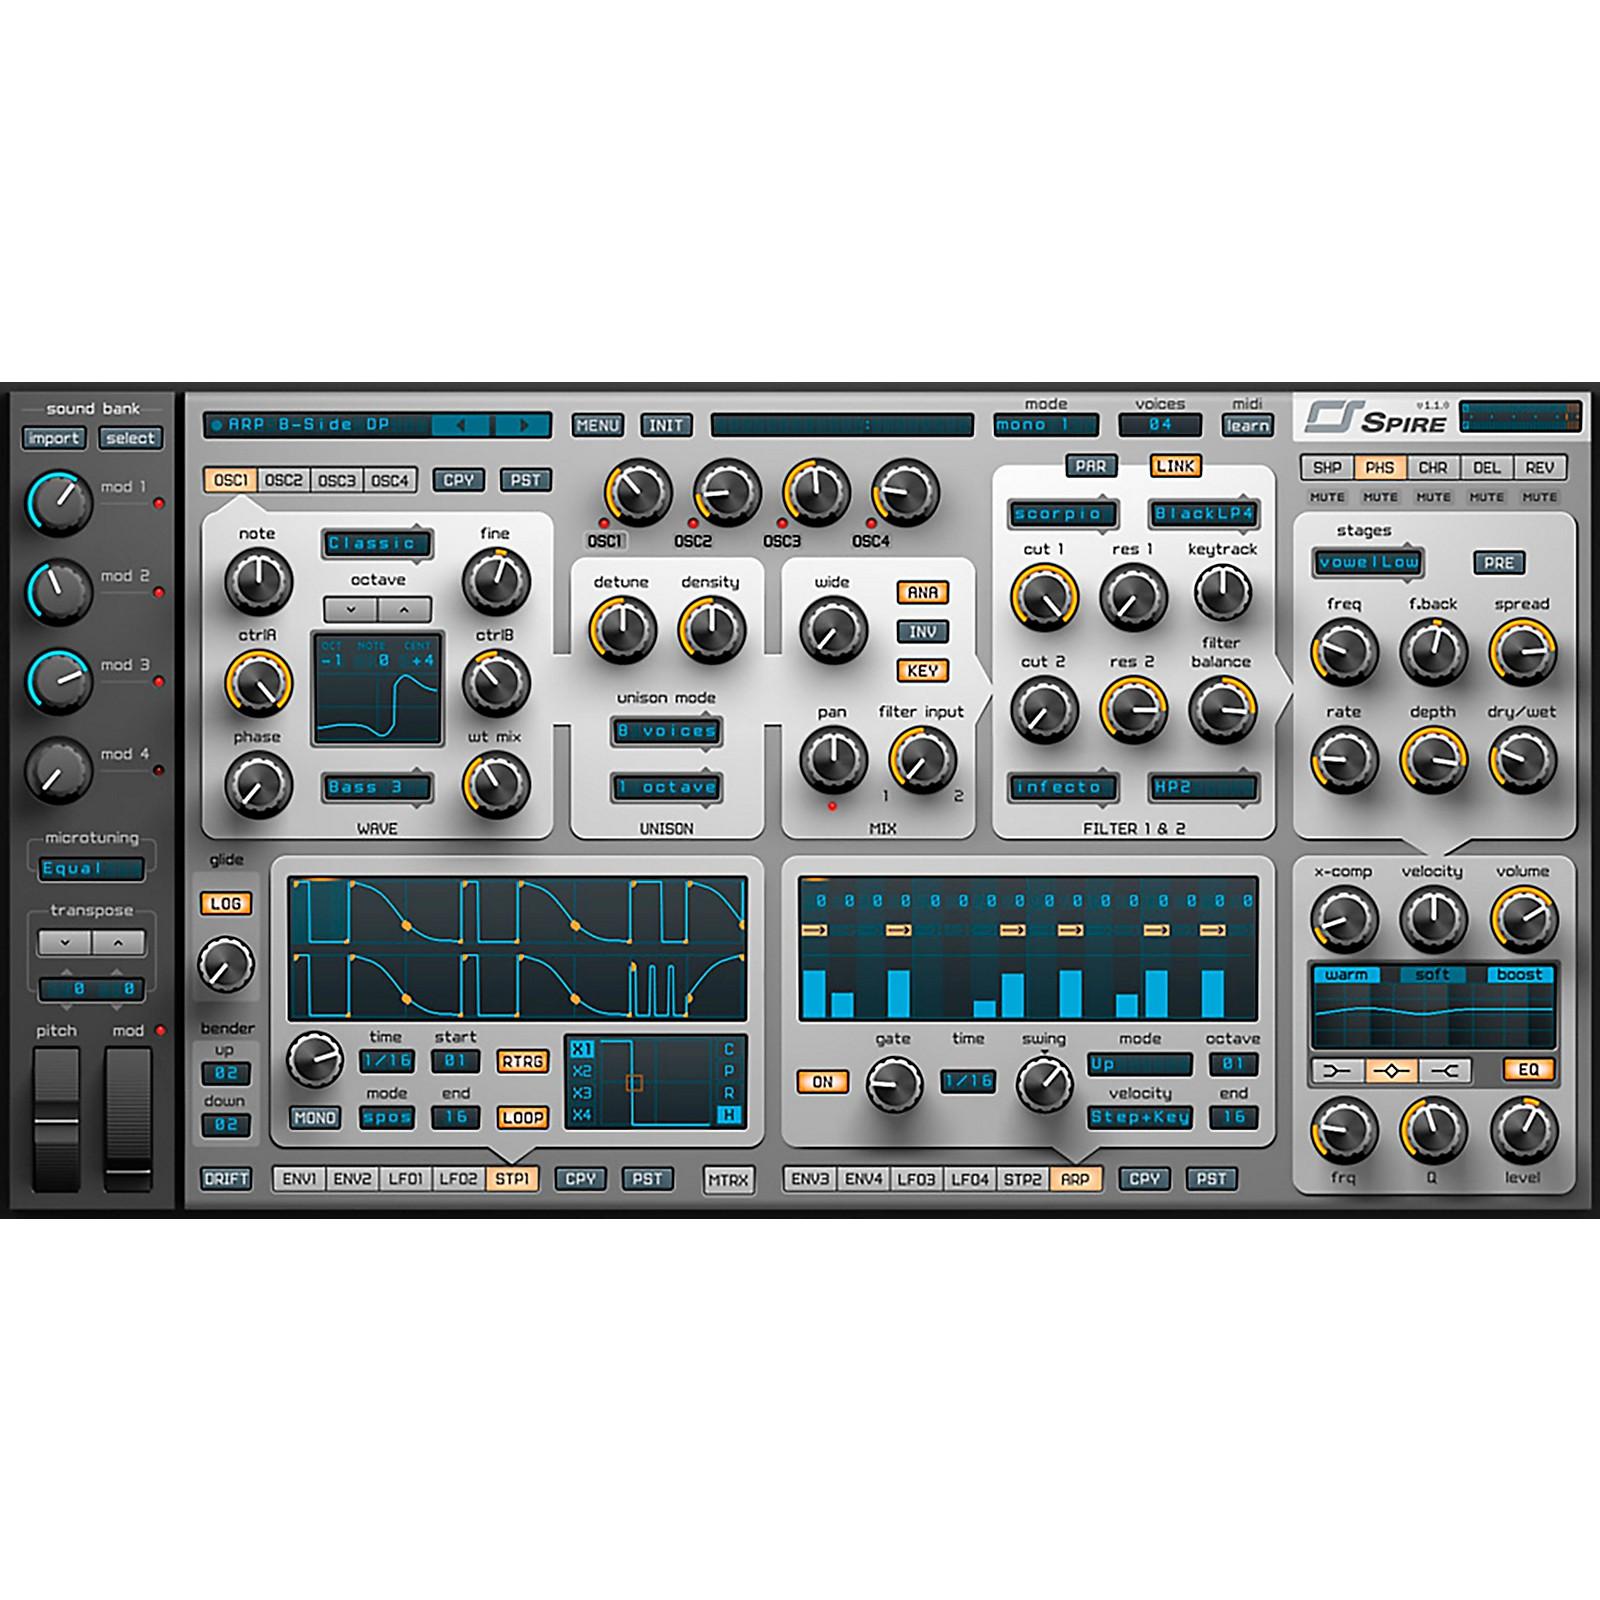 REVEL Spire Virtual Synthesizer